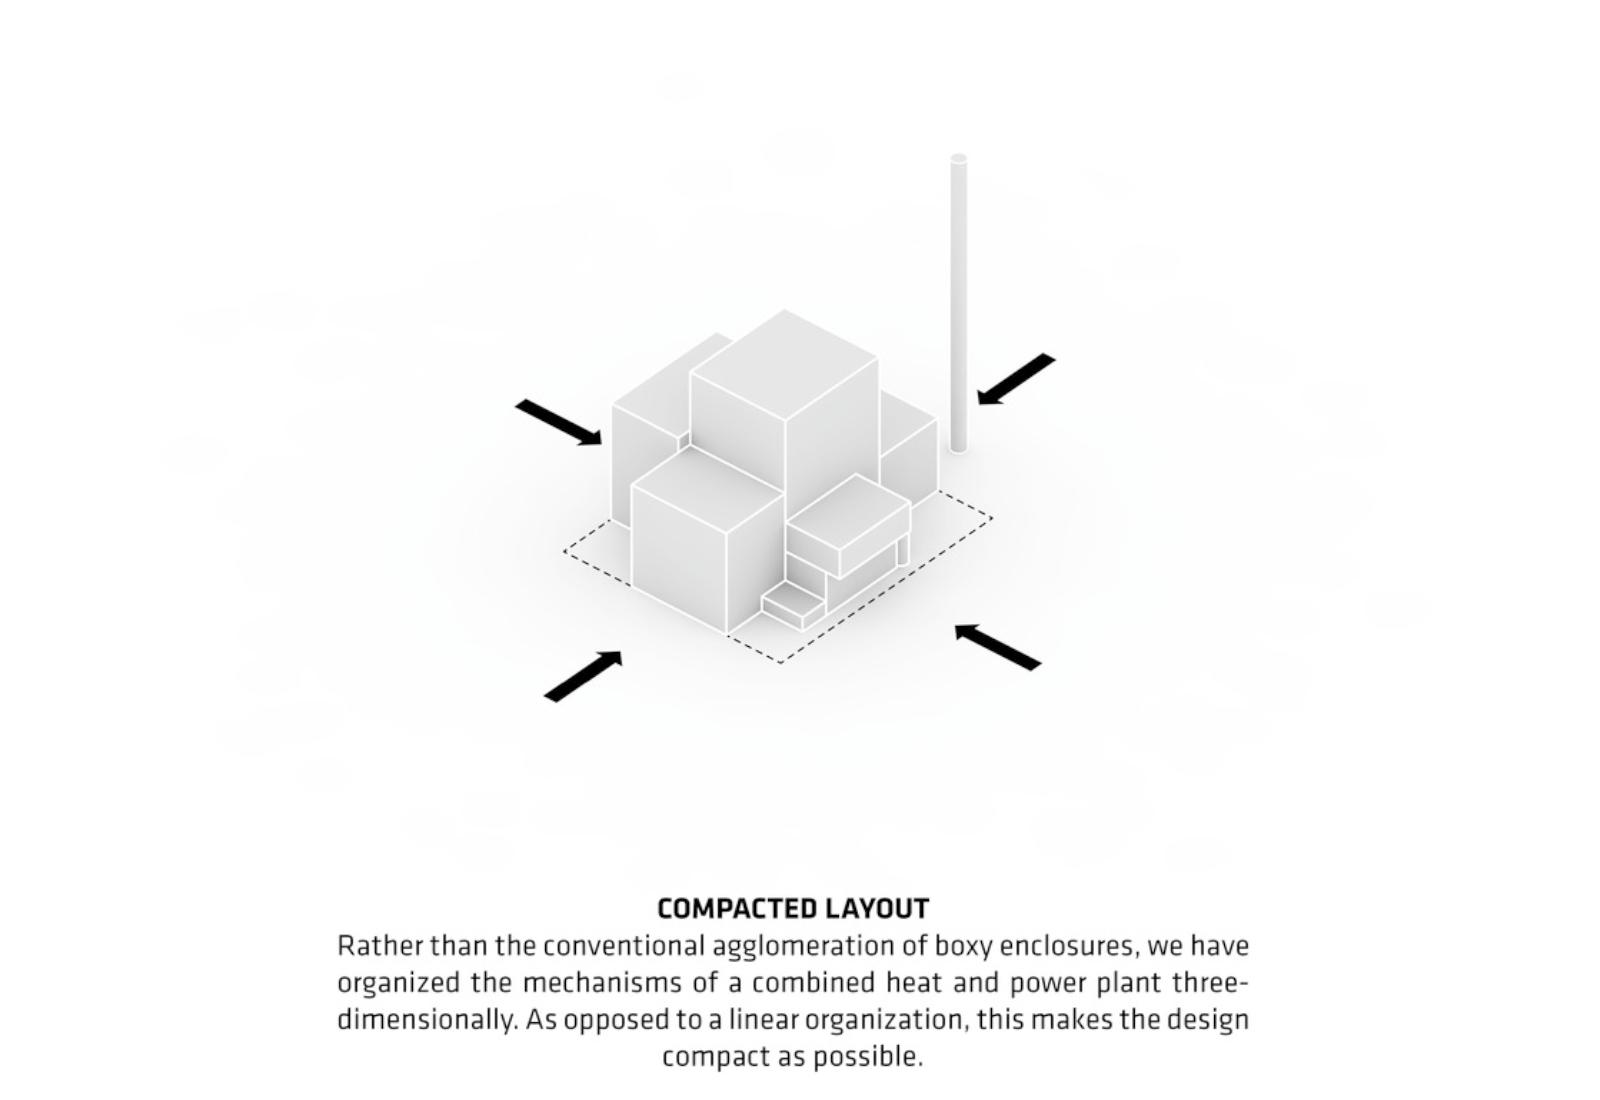 Uppsala Power Plant By Bjarke Ingels Group 11 Layout Design